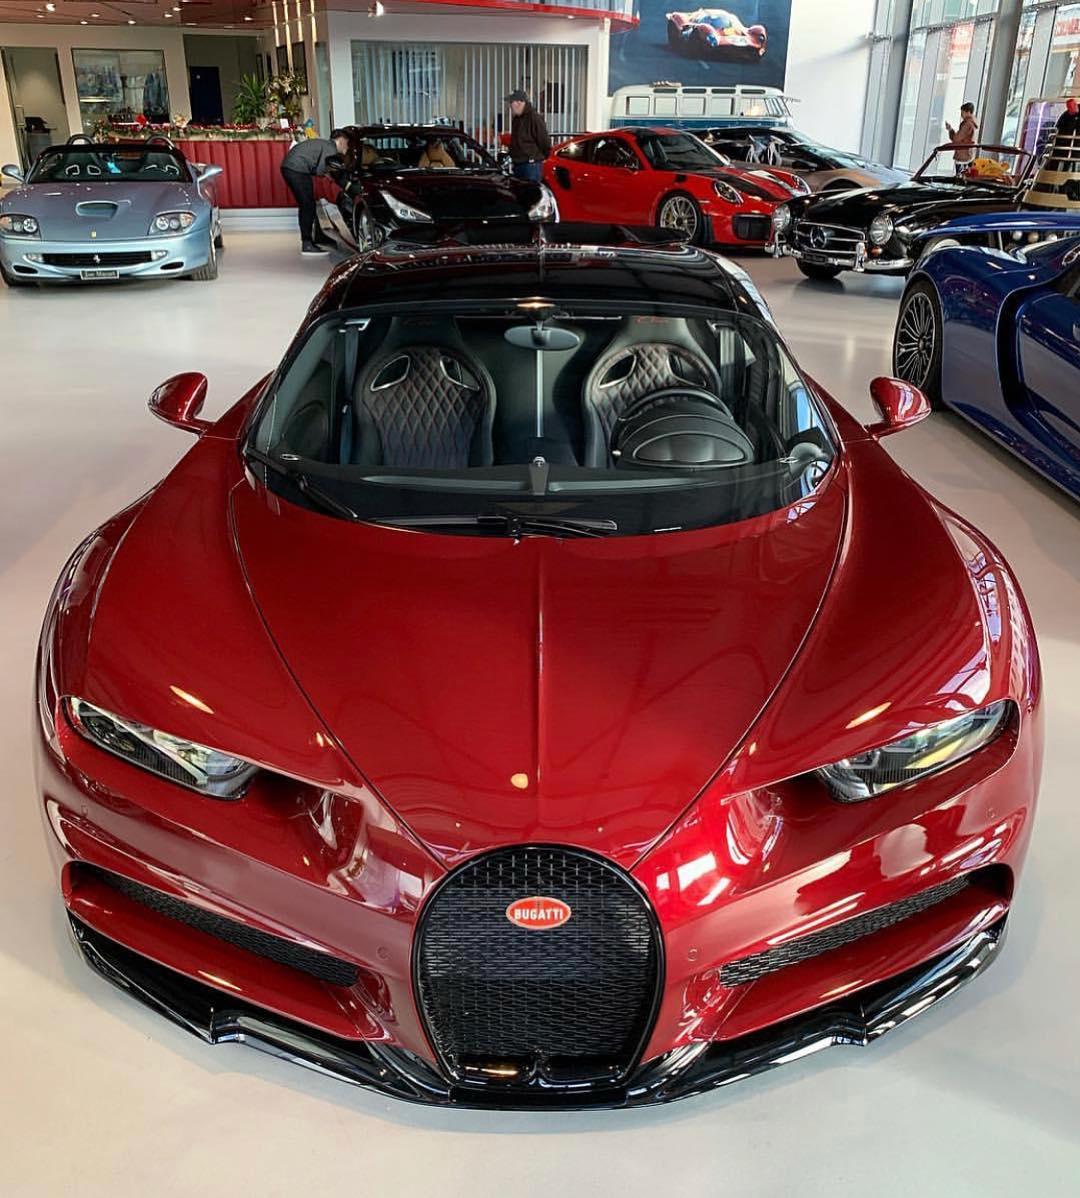 BUGGATI CHIRON SUPER CAR